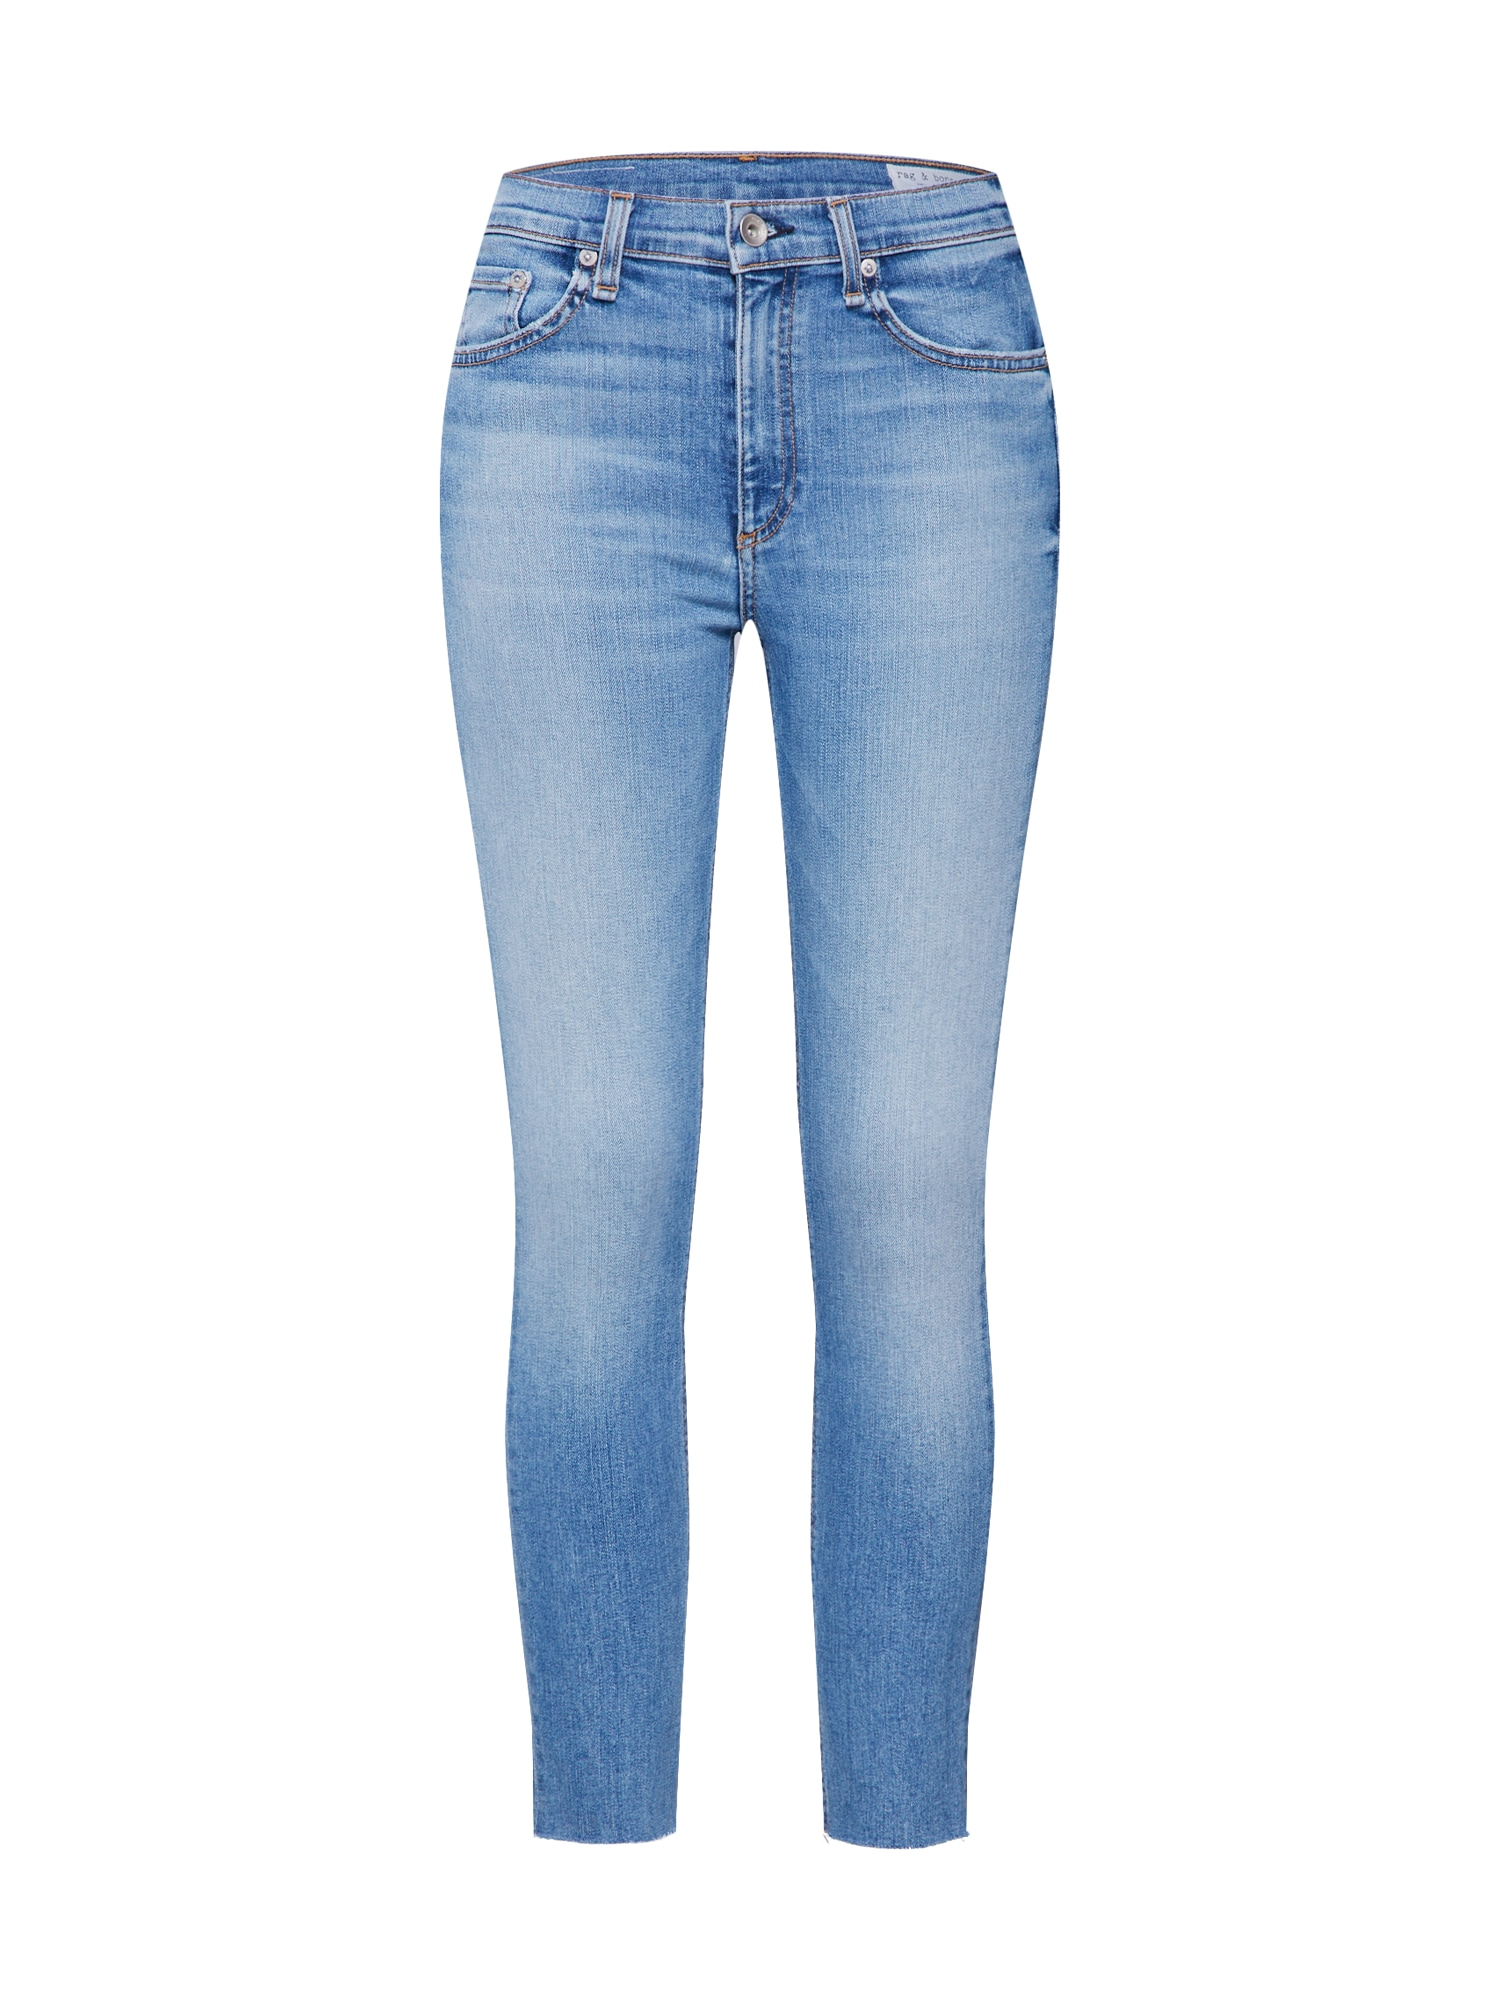 rag & bone Džinsai tamsiai (džinso) mėlyna